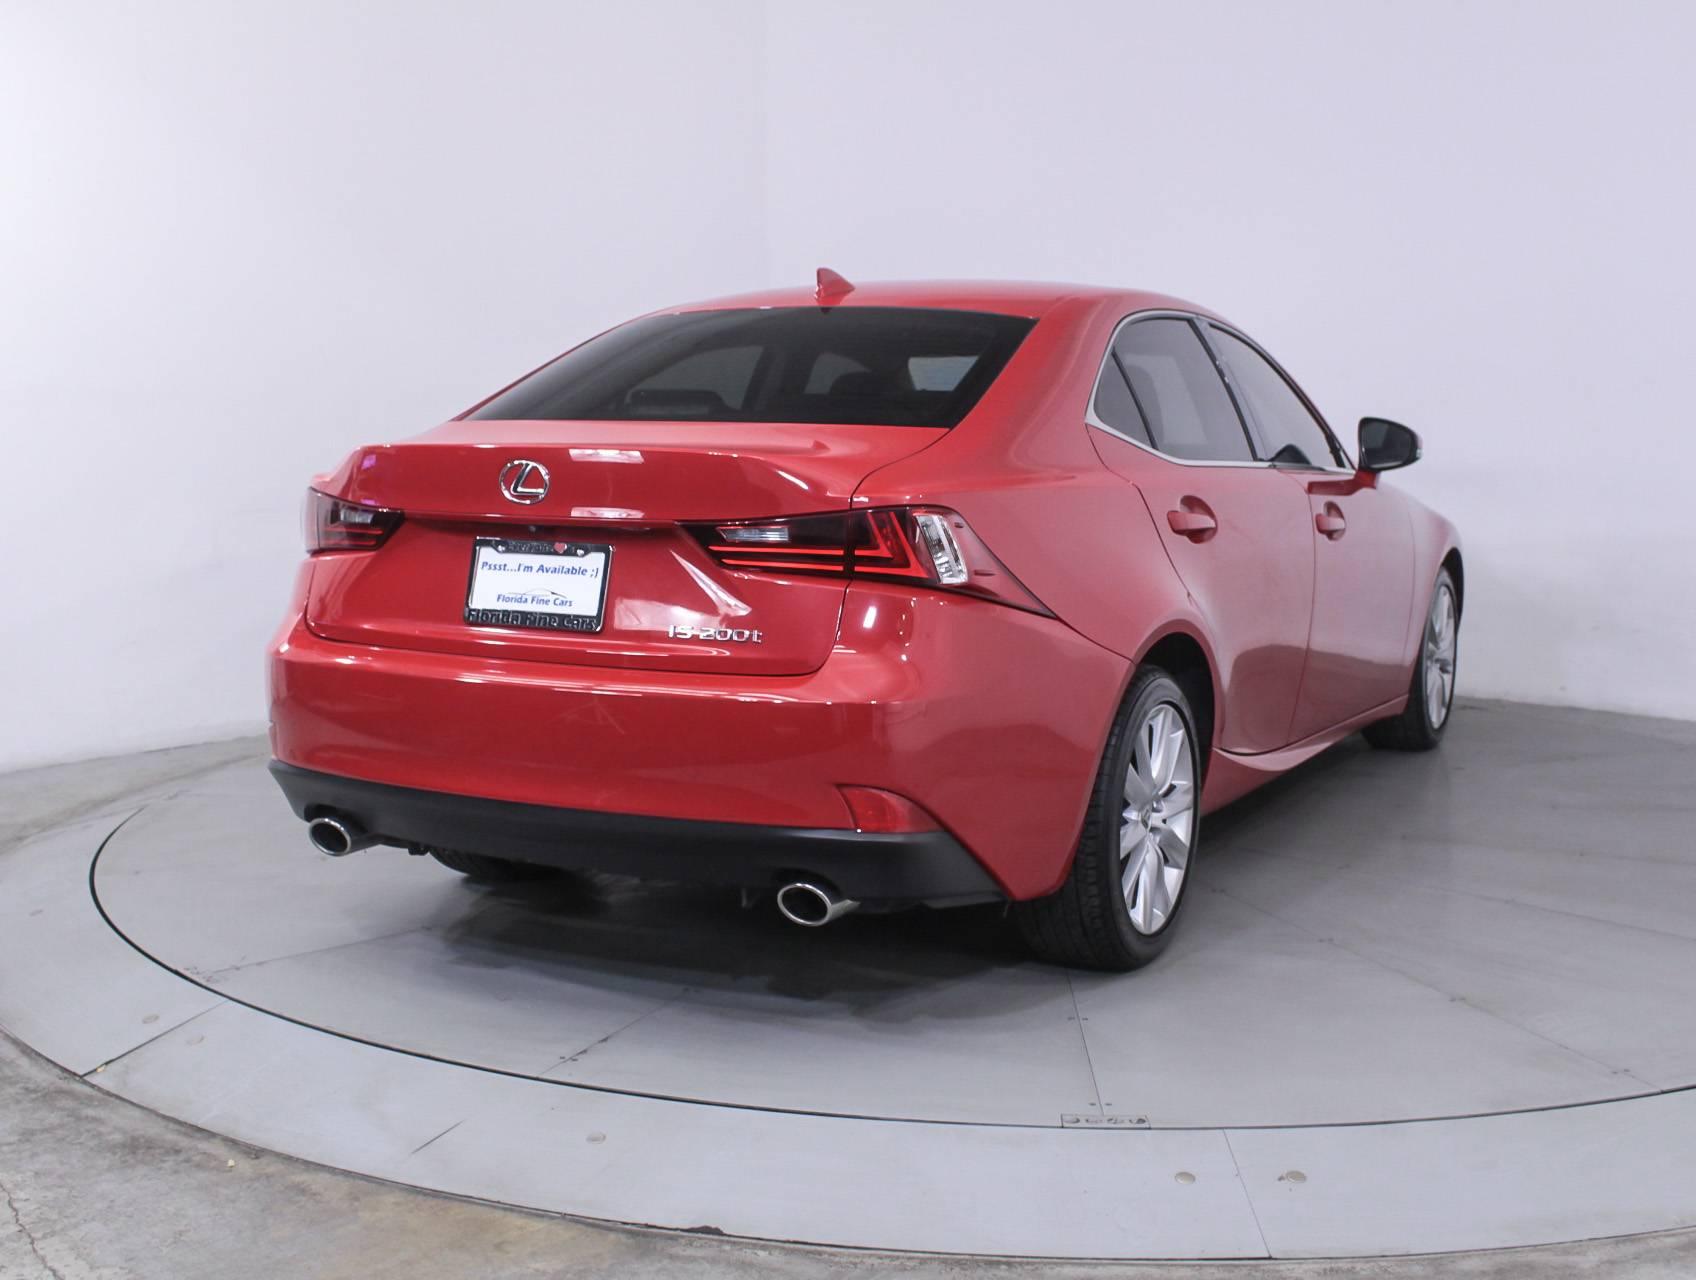 Used 2016 LEXUS IS 200T Sedan for sale in MIAMI FL